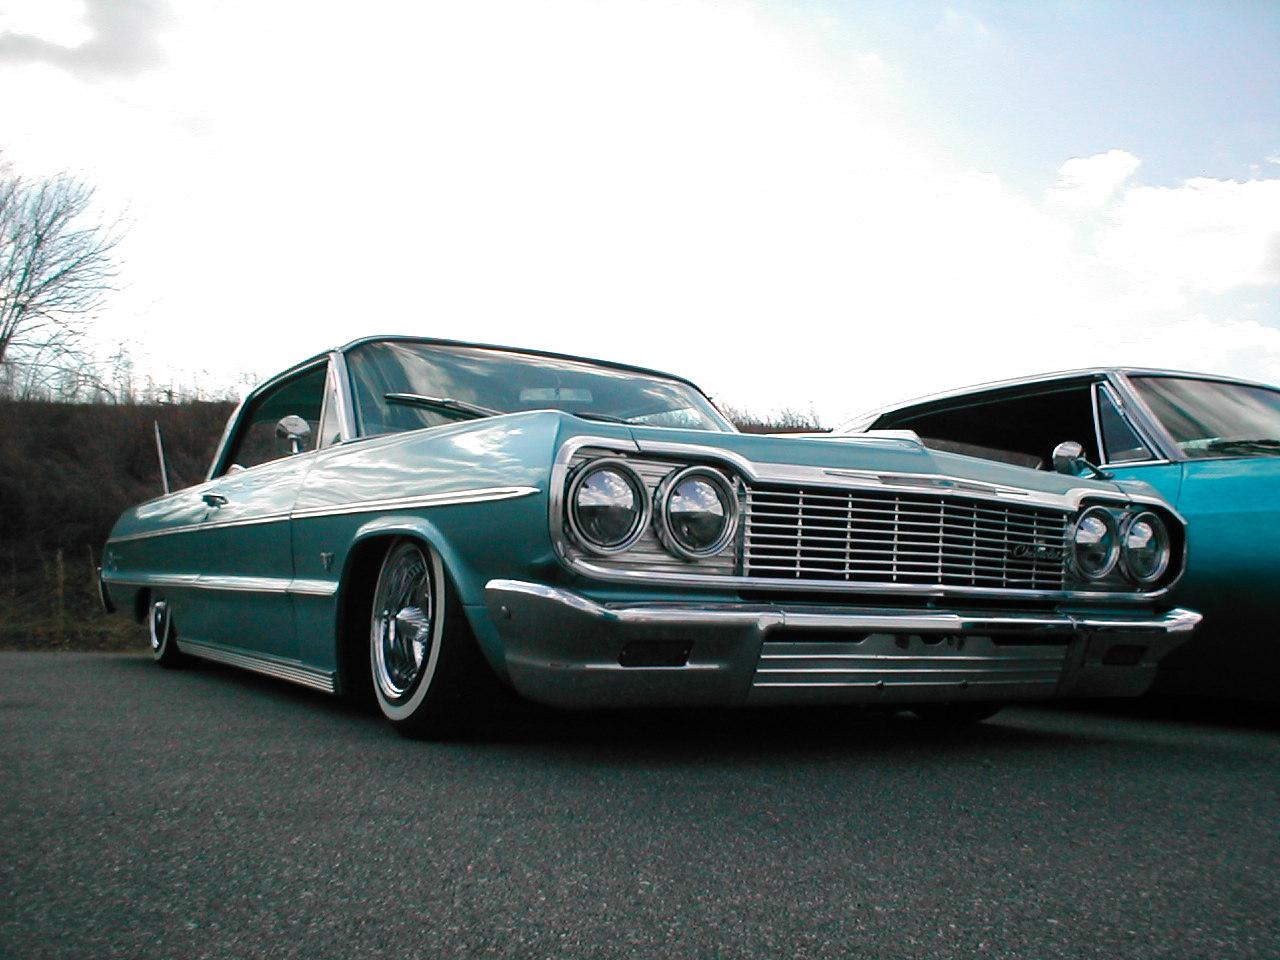 1964 Impala Lowrider Wallpaper 1280x960